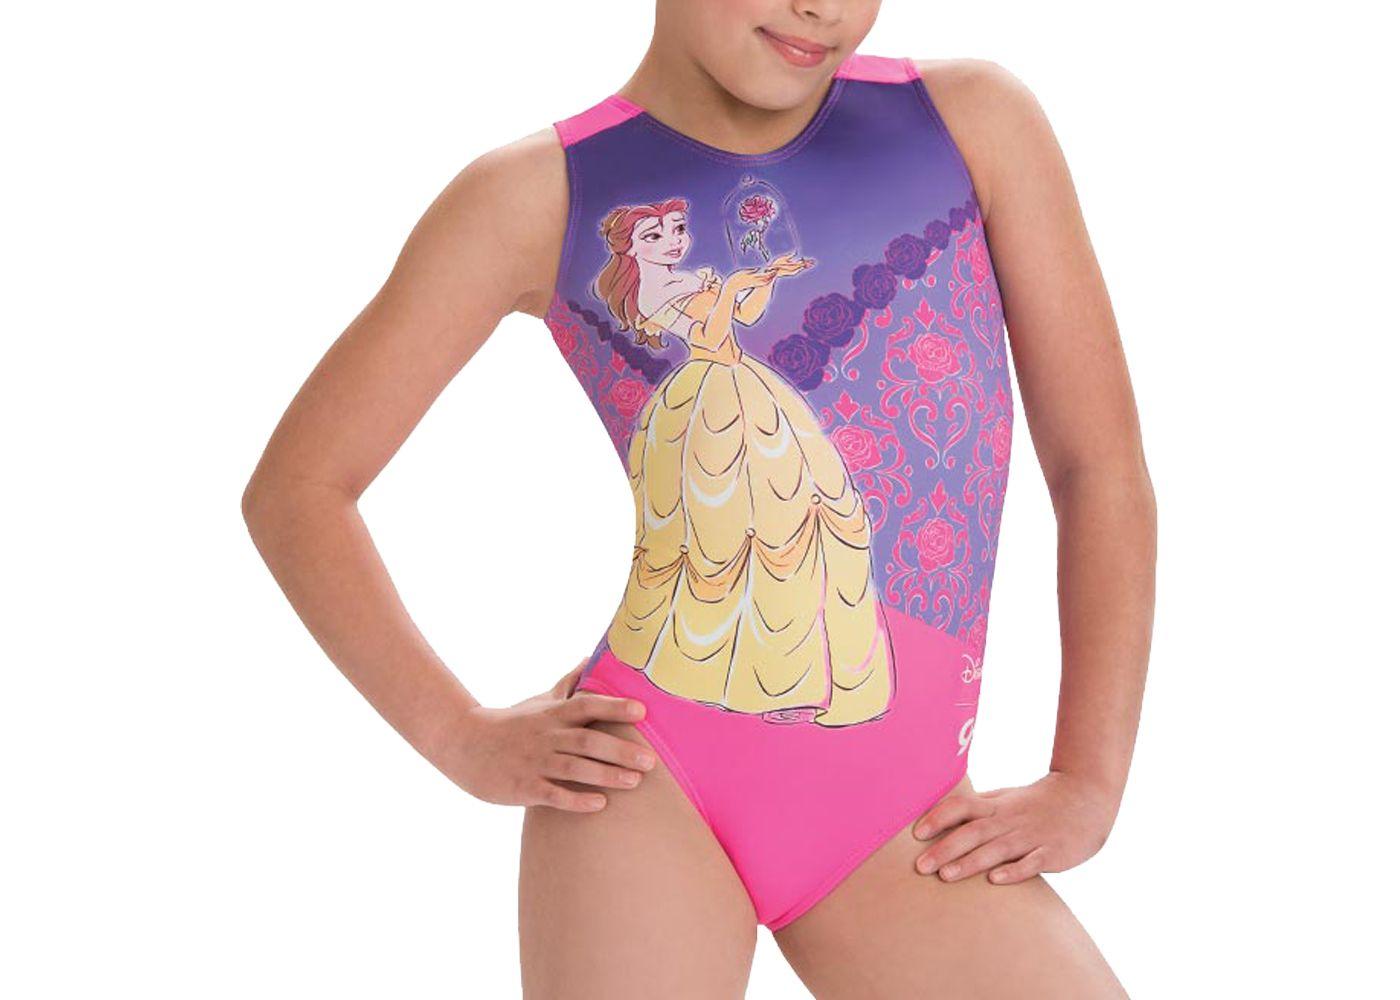 GK Elite Disney Beauty and The Beast Gymnastics Leotard